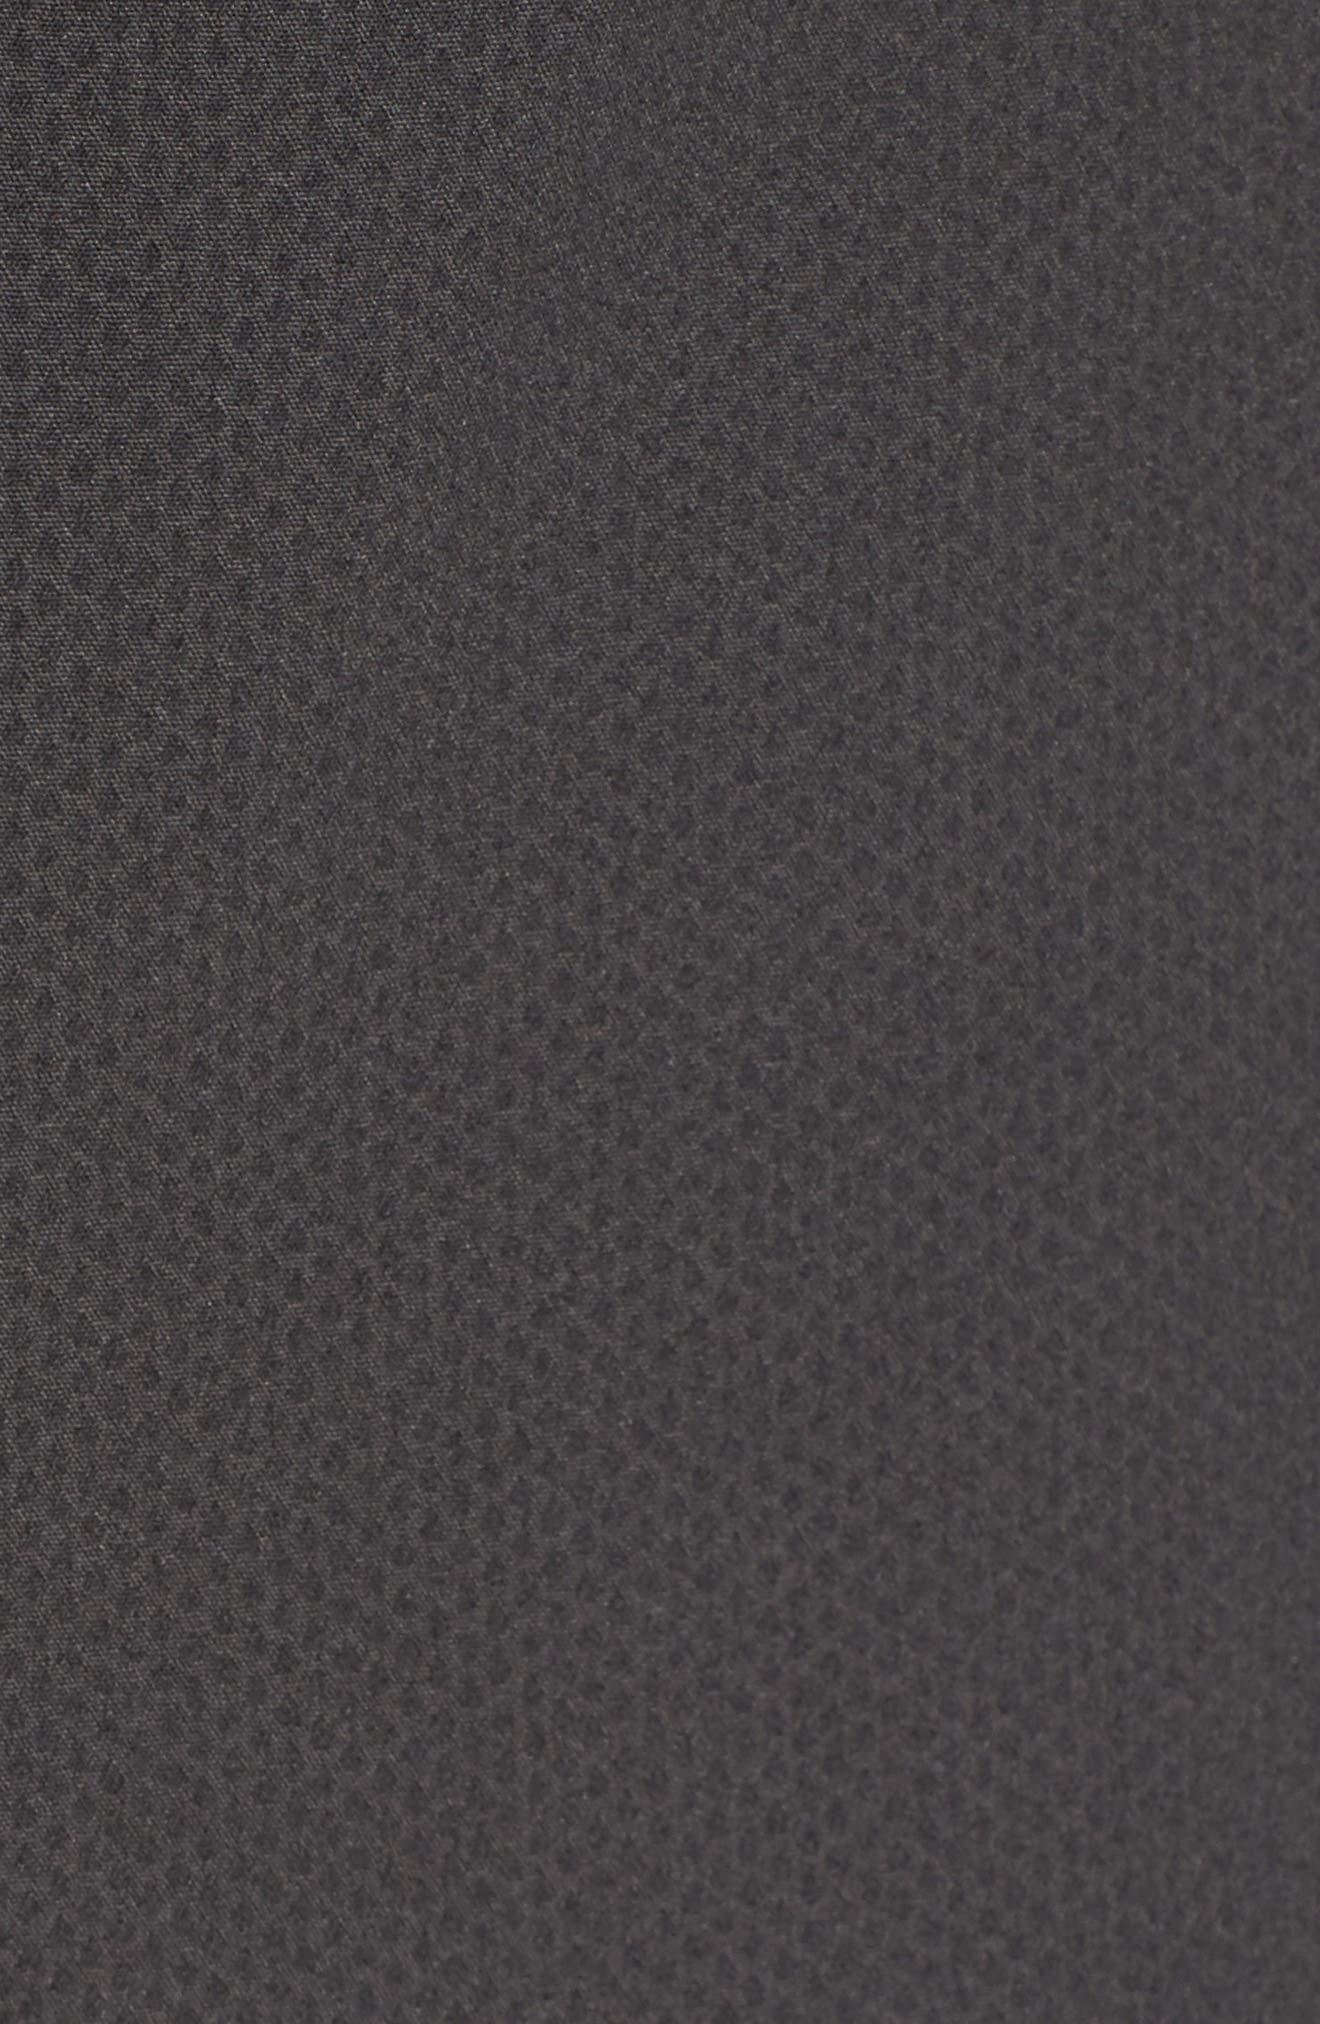 Surf N' Turf Dry Cargo Hybrid Shorts,                             Alternate thumbnail 5, color,                             020